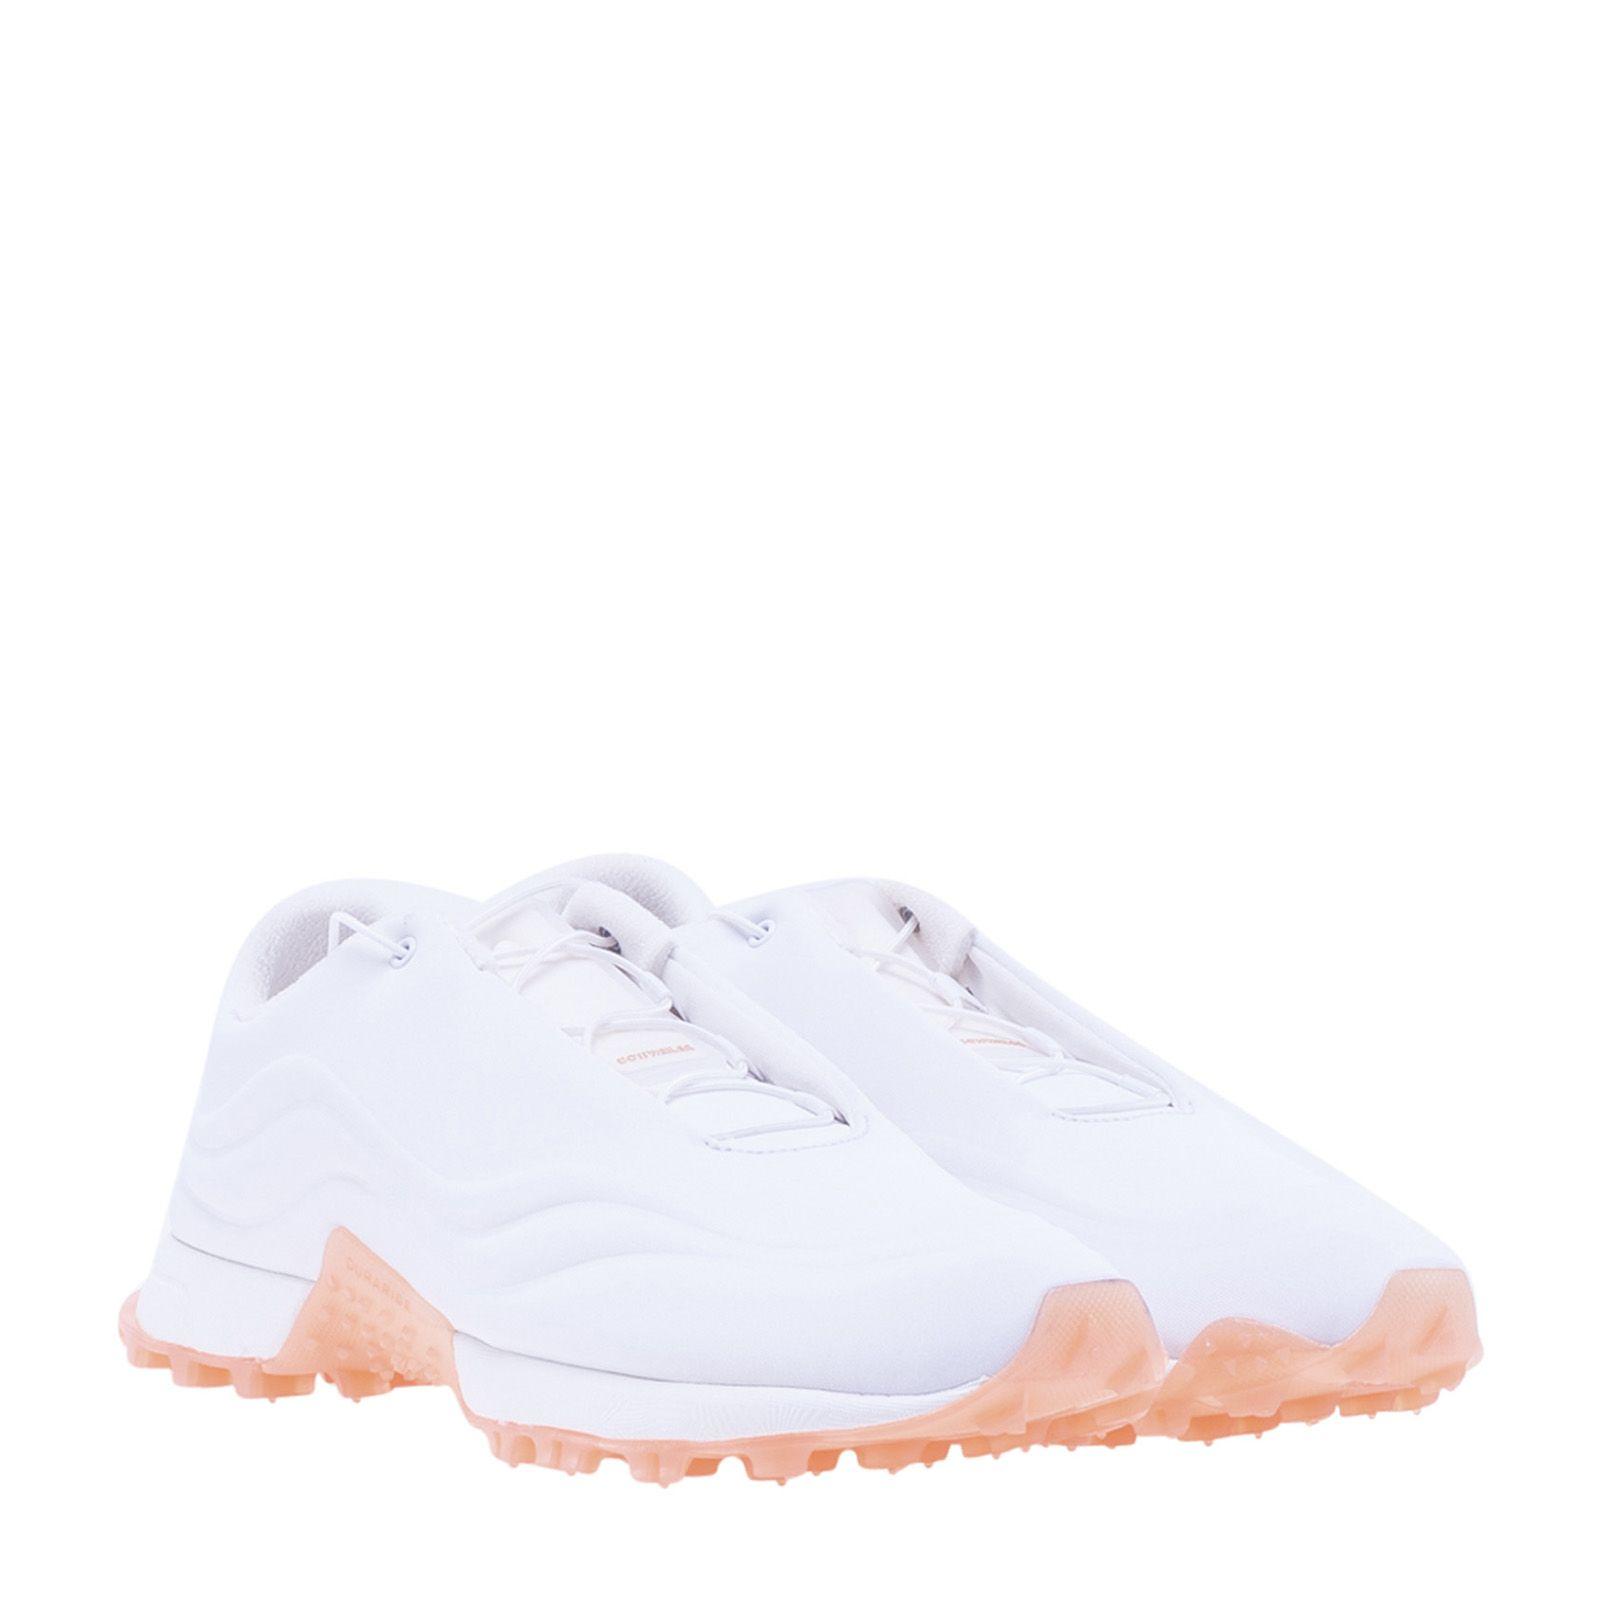 Reebok Lacets Push Chaussures De Sport - Blanc Iv1Tb